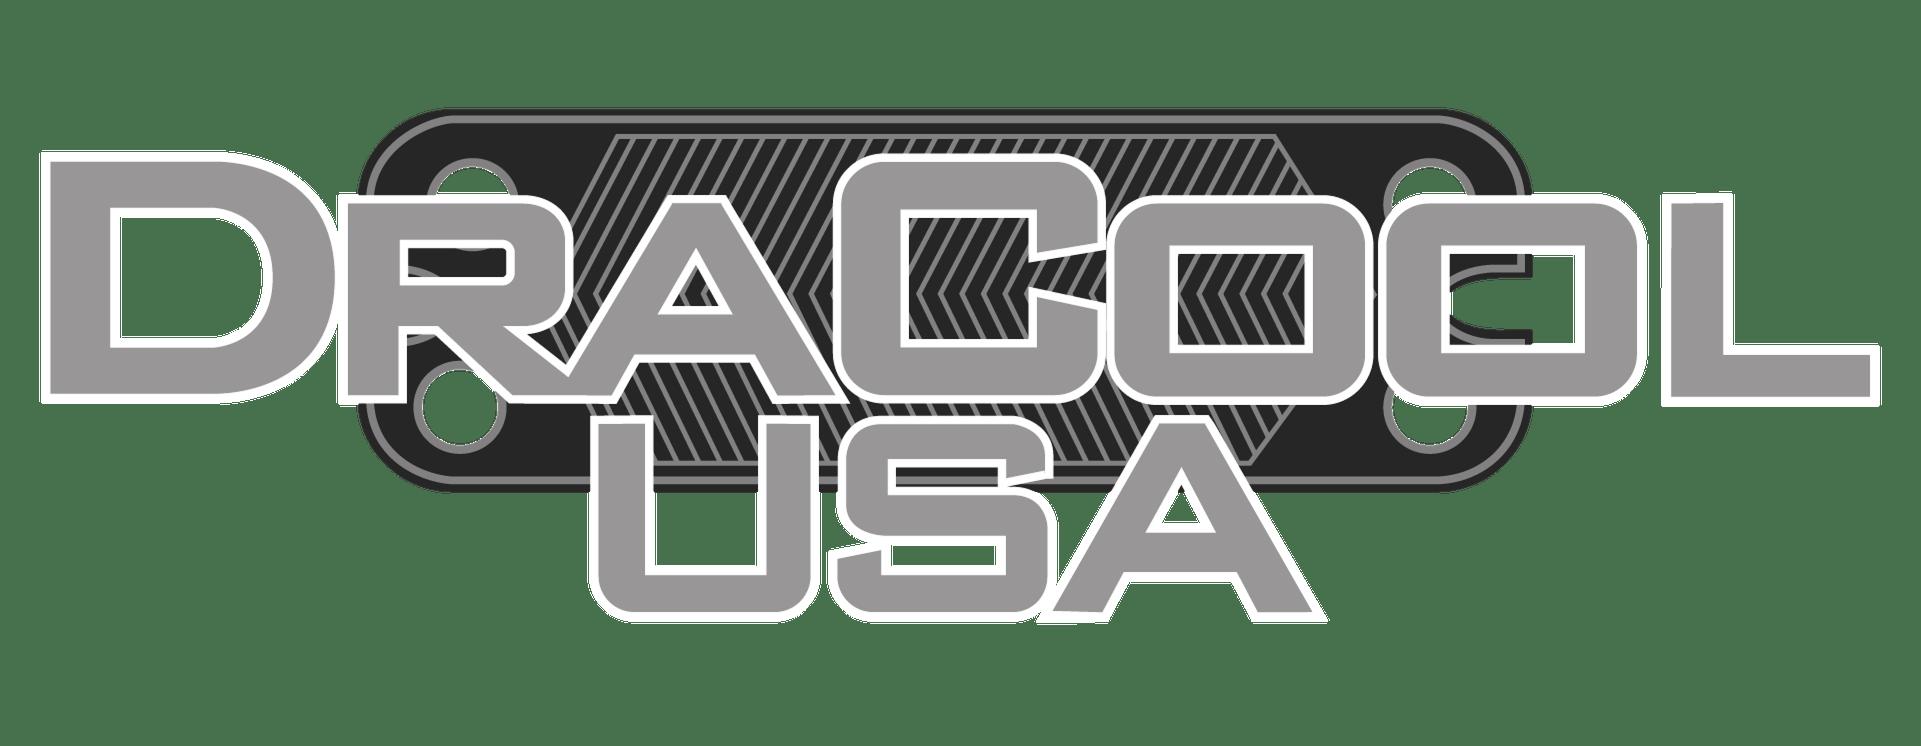 DraCool-USA